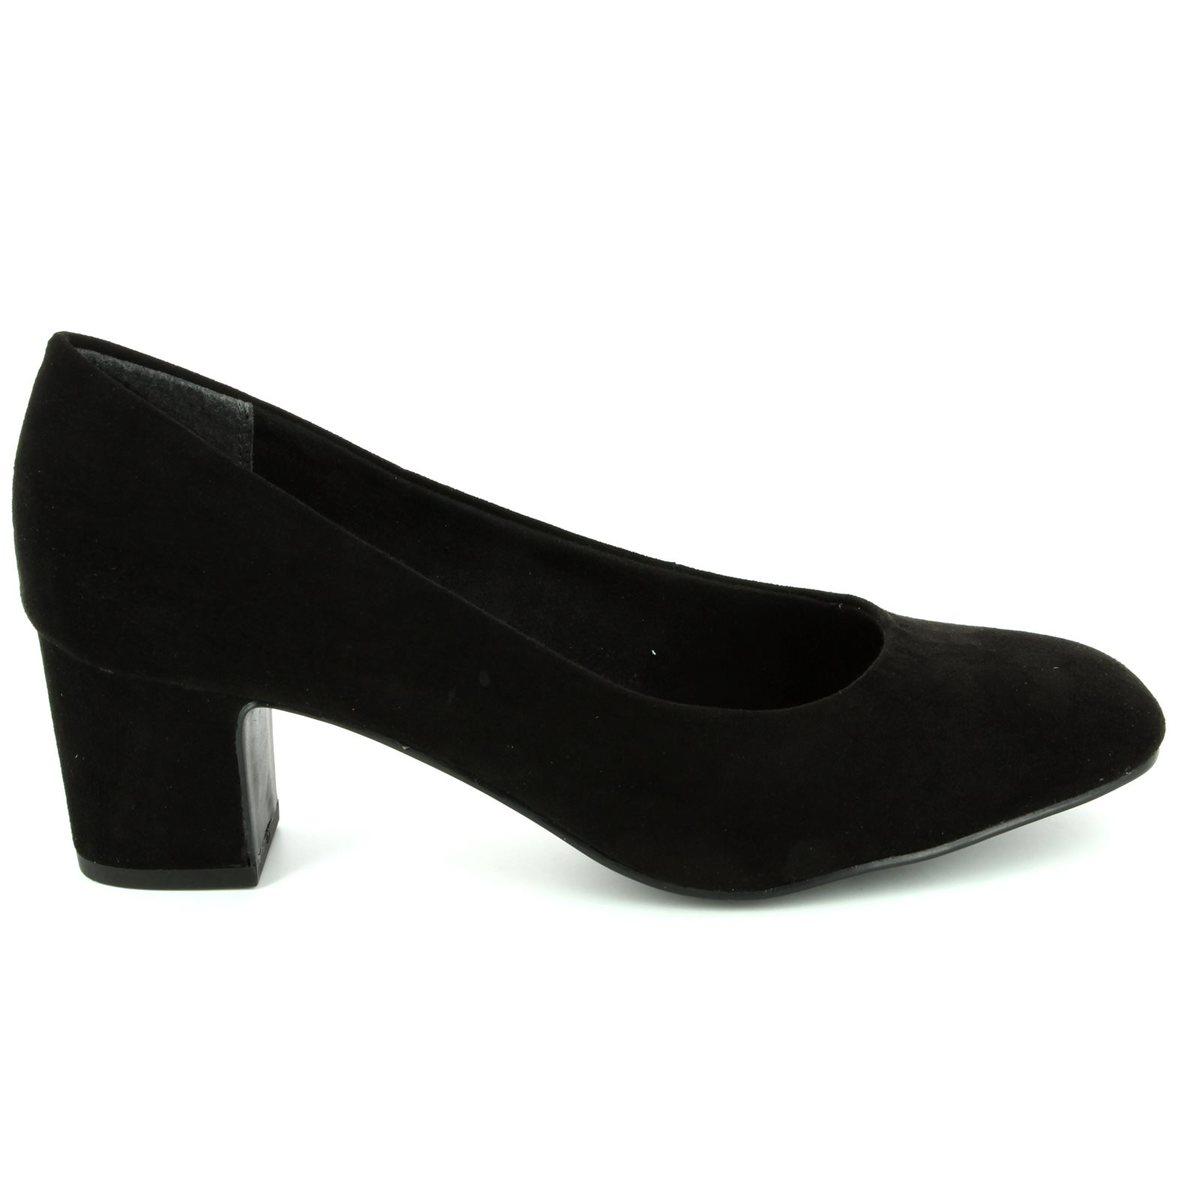 Marco Tozzi High-heeled Shoes - Black - 22426/001 PERI